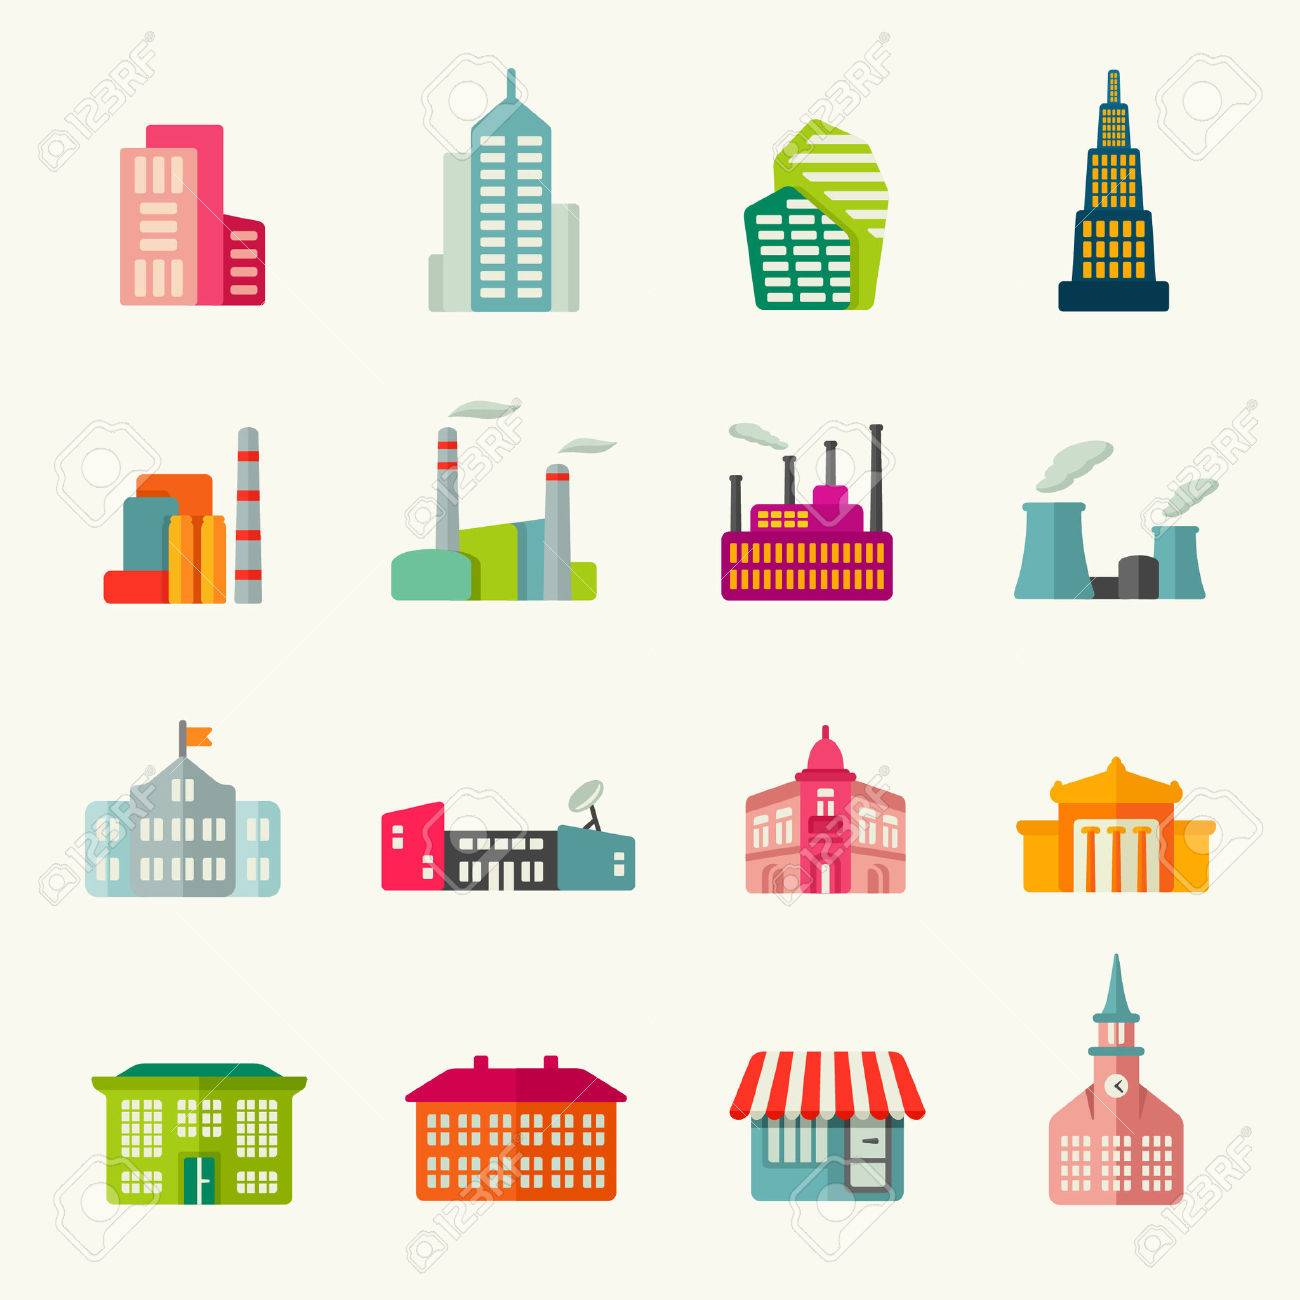 Buildings icon set - 40243411